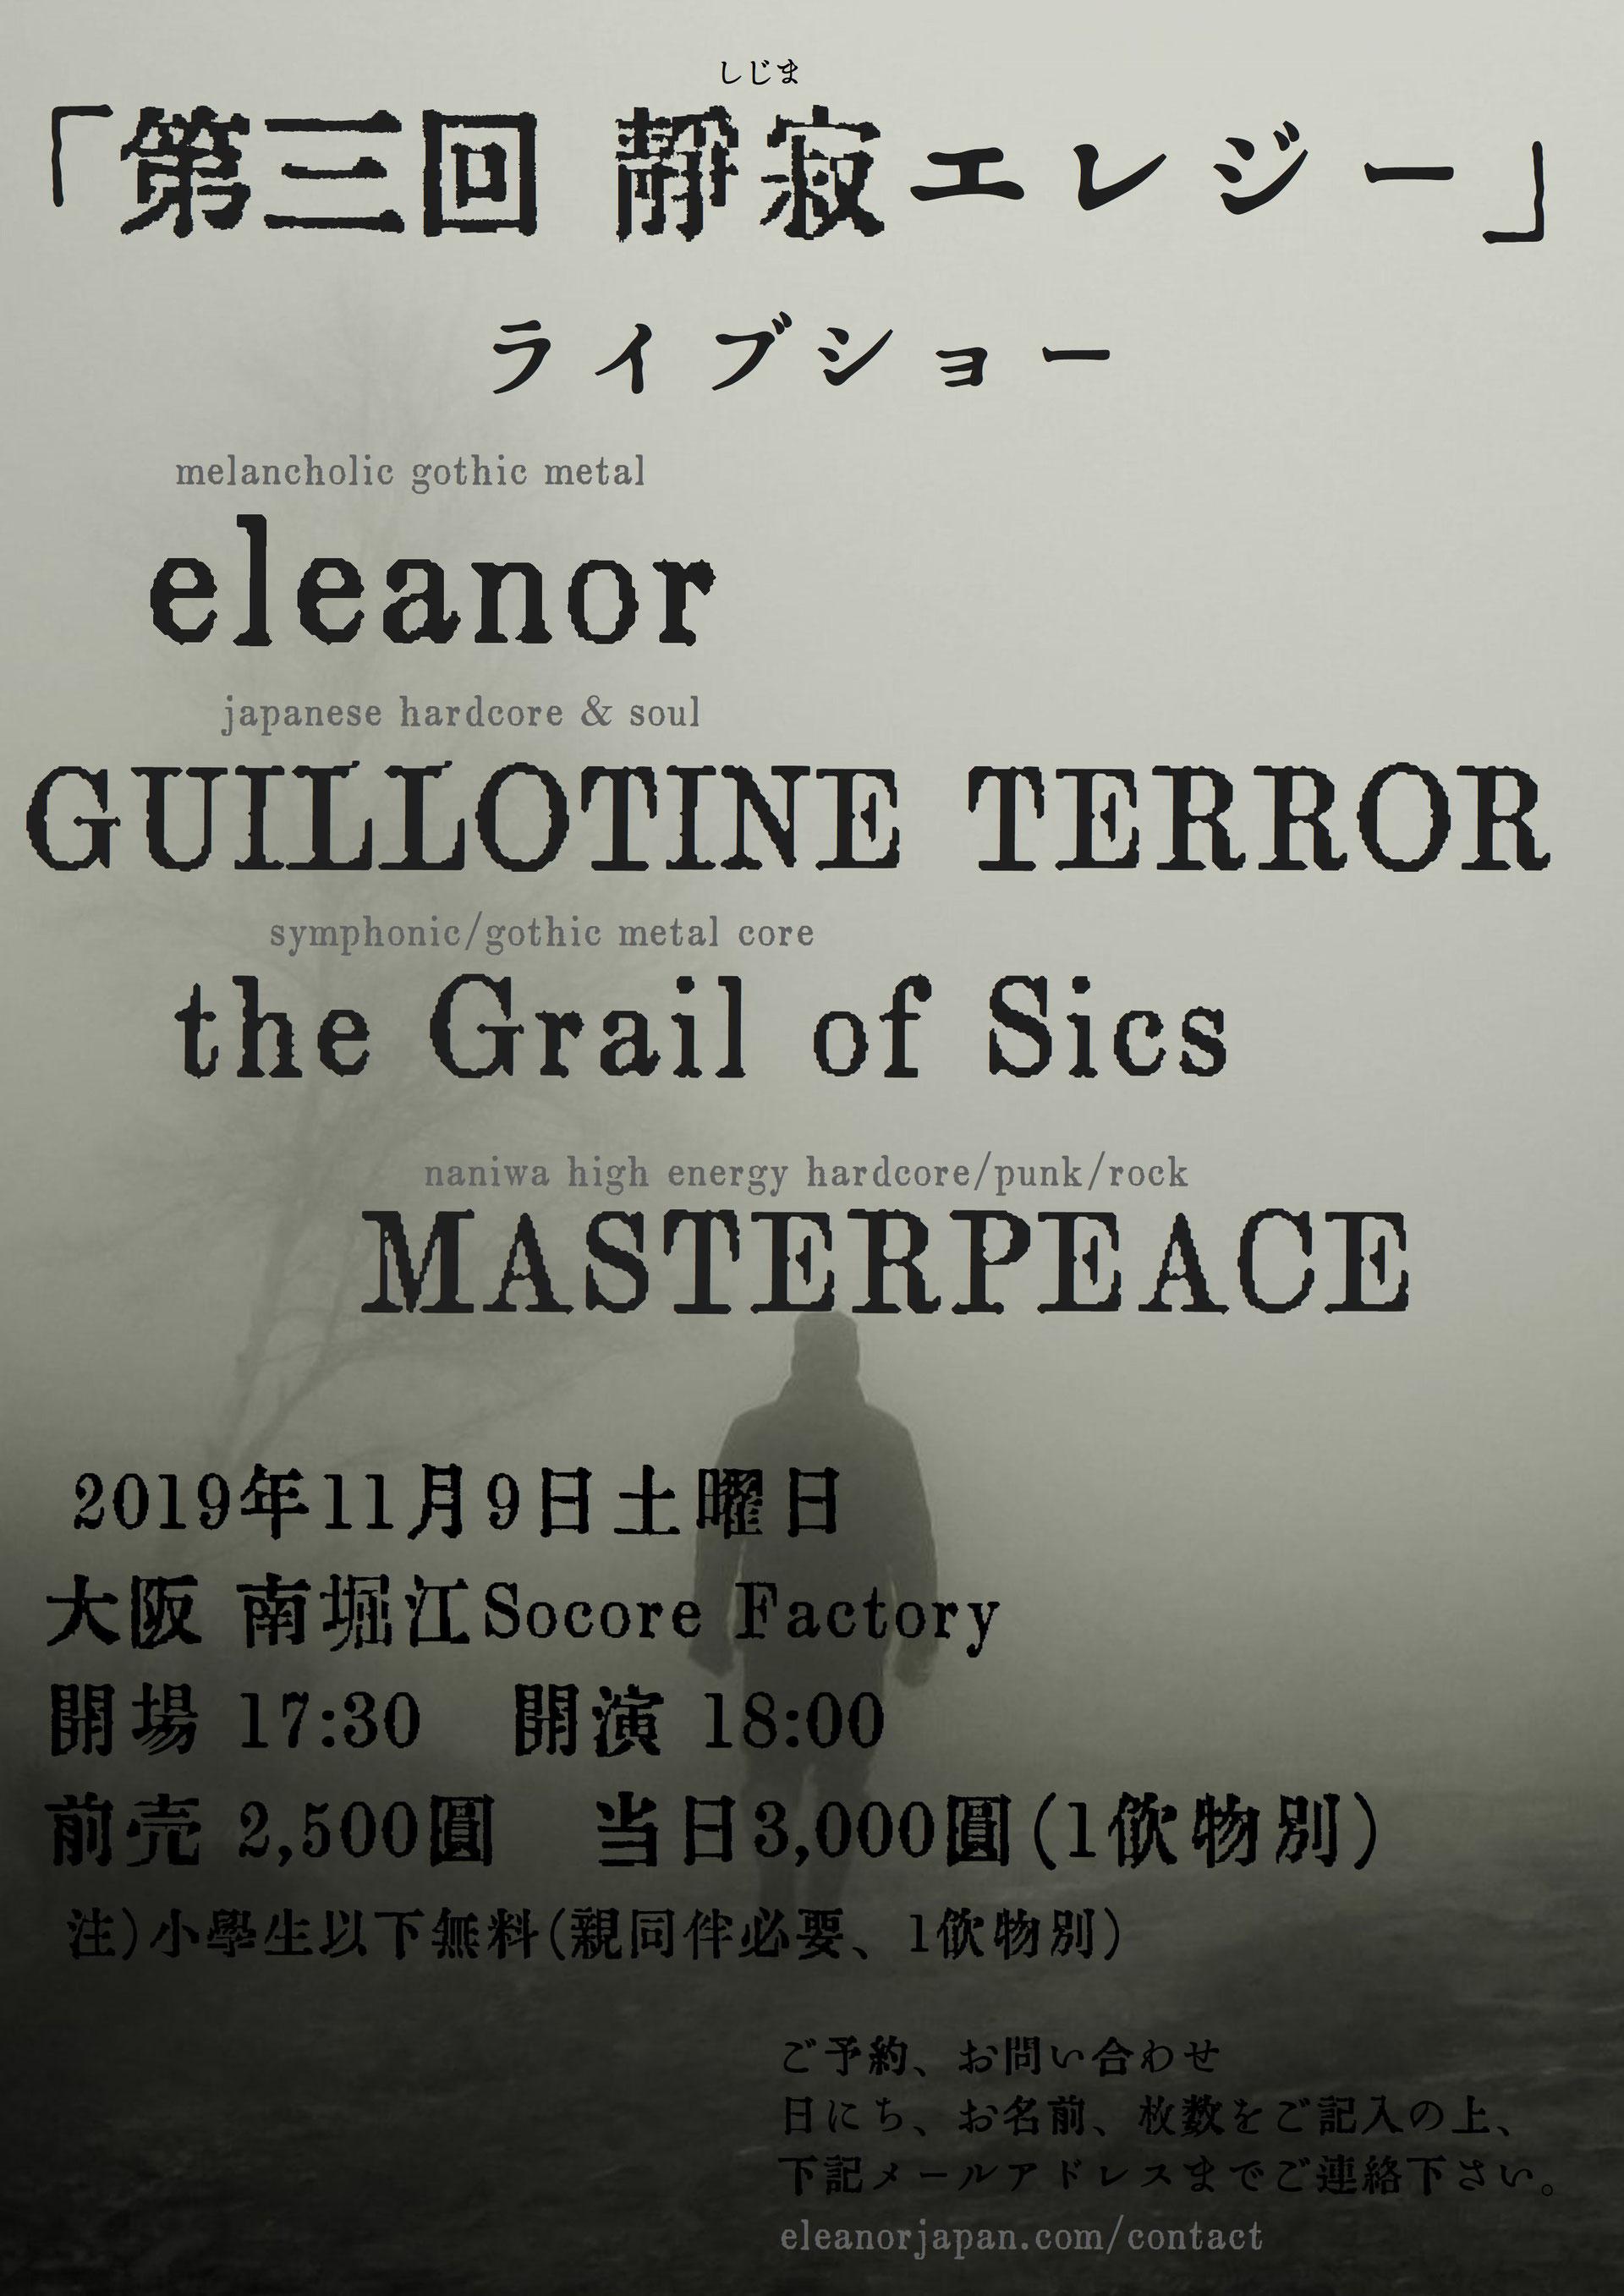 eleanor - Melancholic Gothic Metal Japan